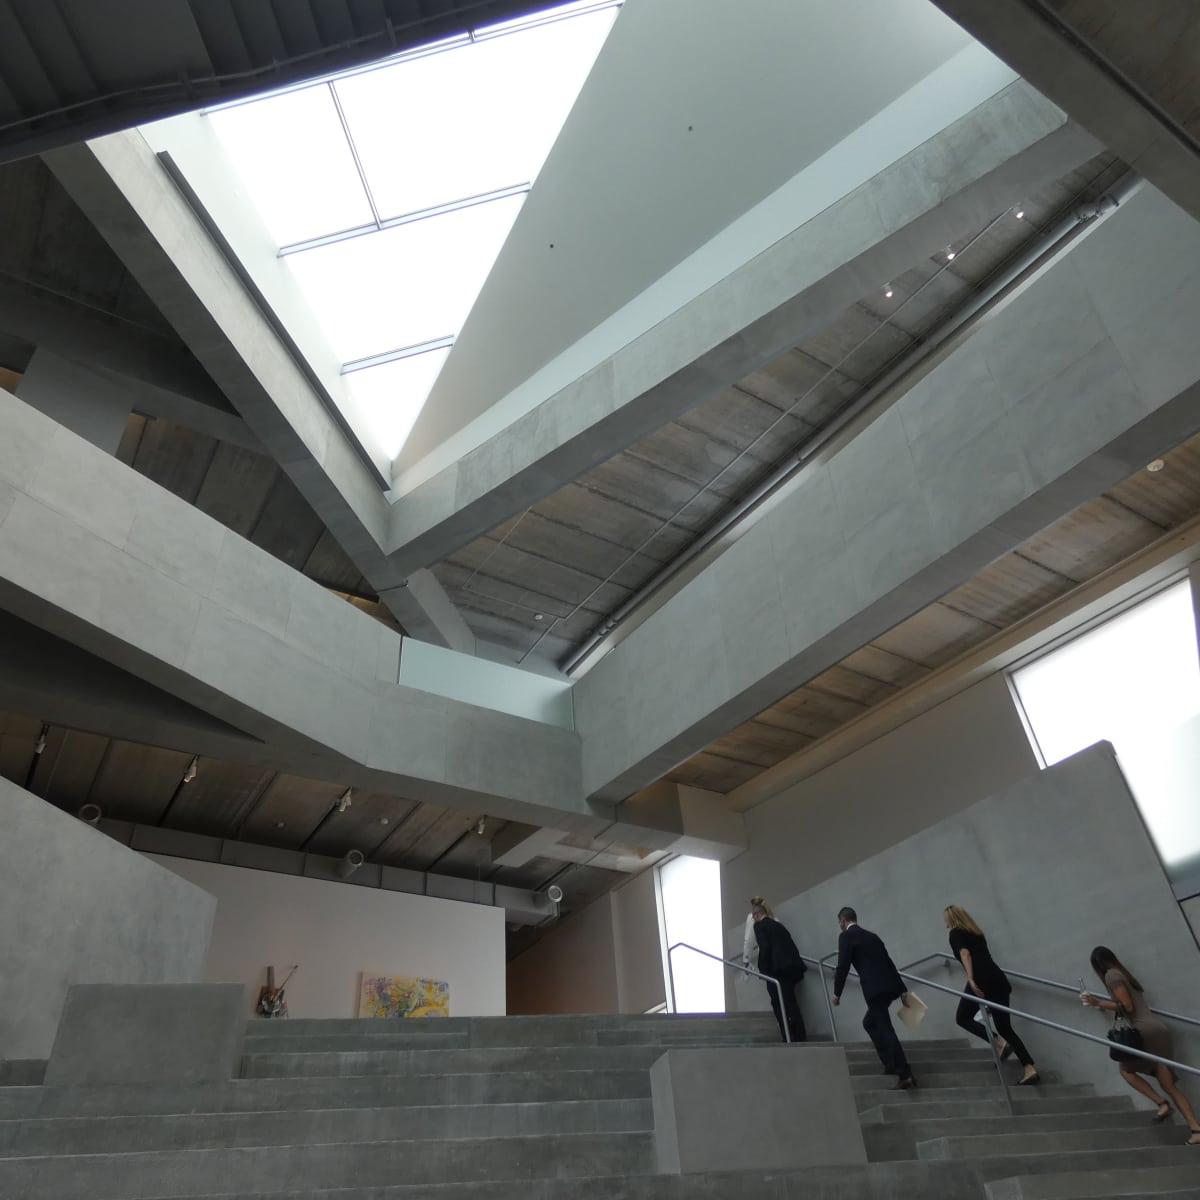 Glassell School central stairway